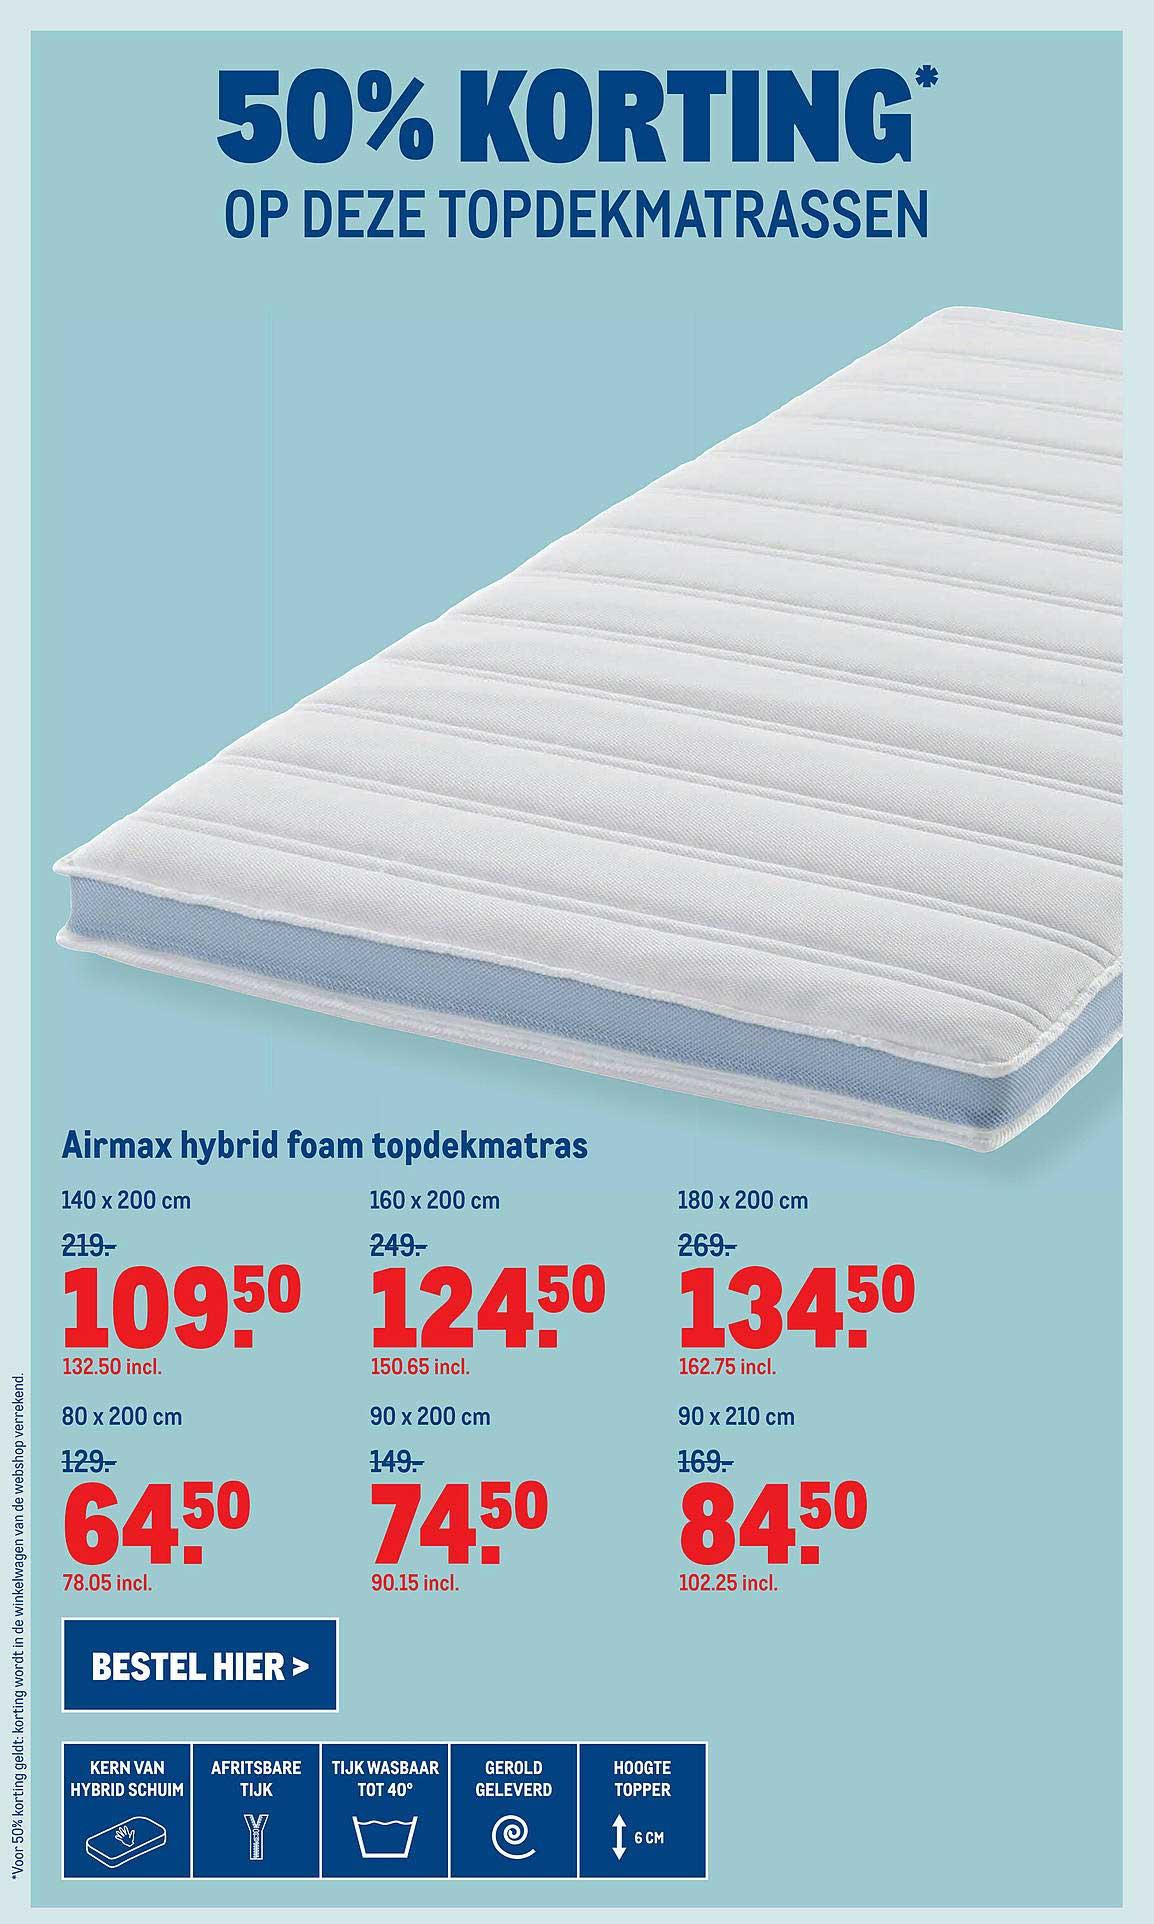 Makro Airmax Hybrid Foam Topdekmatras 50% Korting